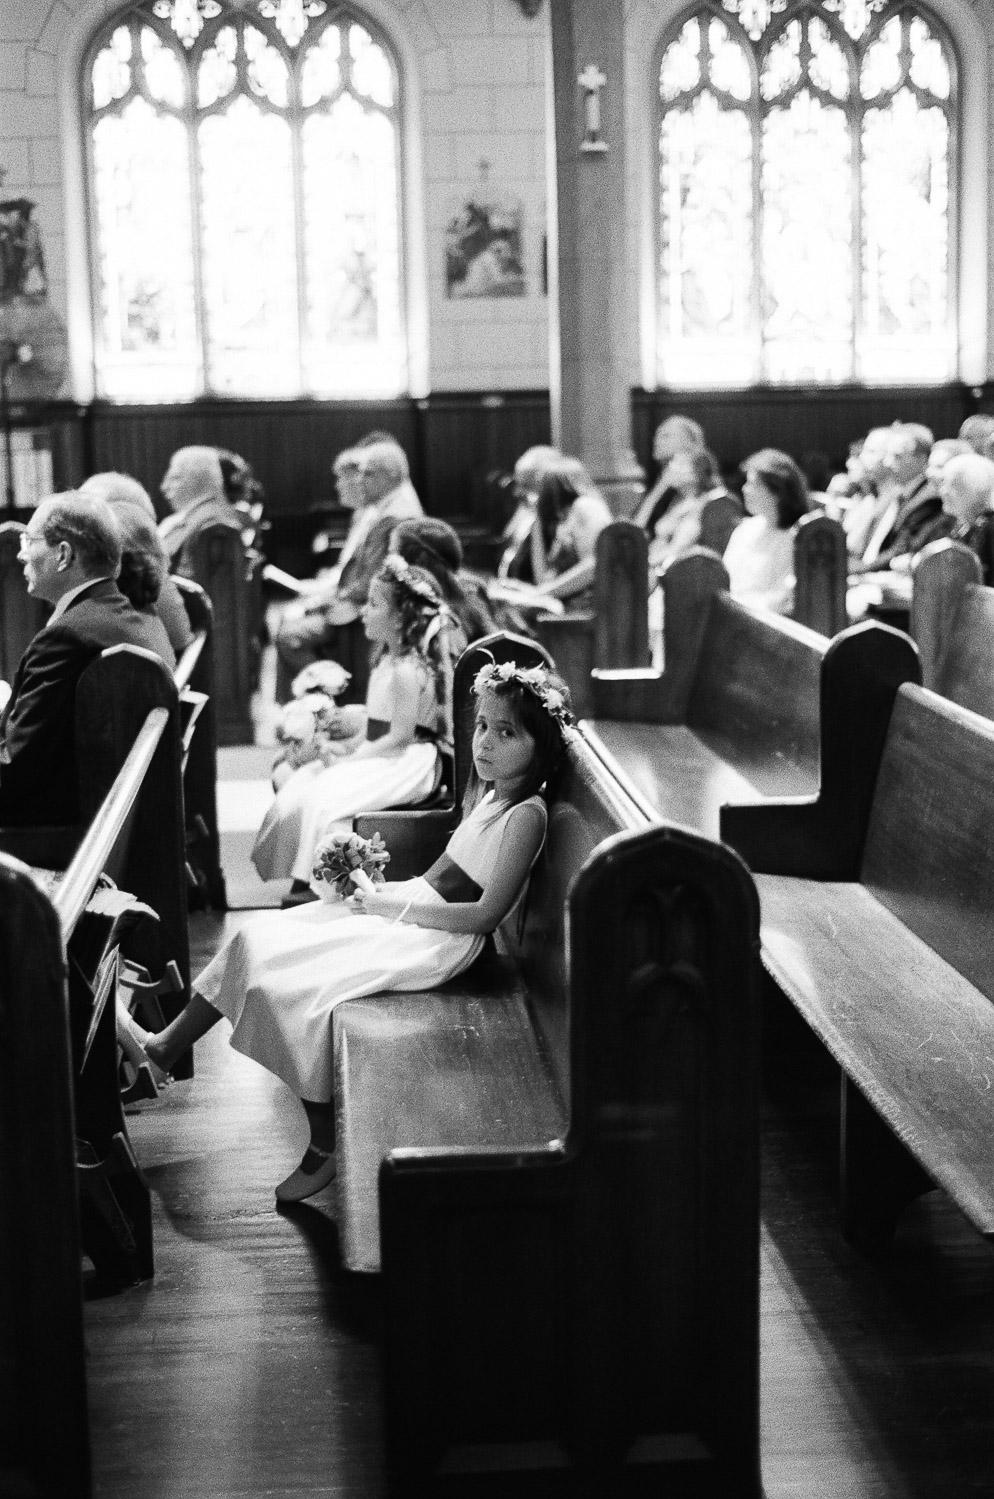 hamptons ny wedding church ceremony by wendy g photography